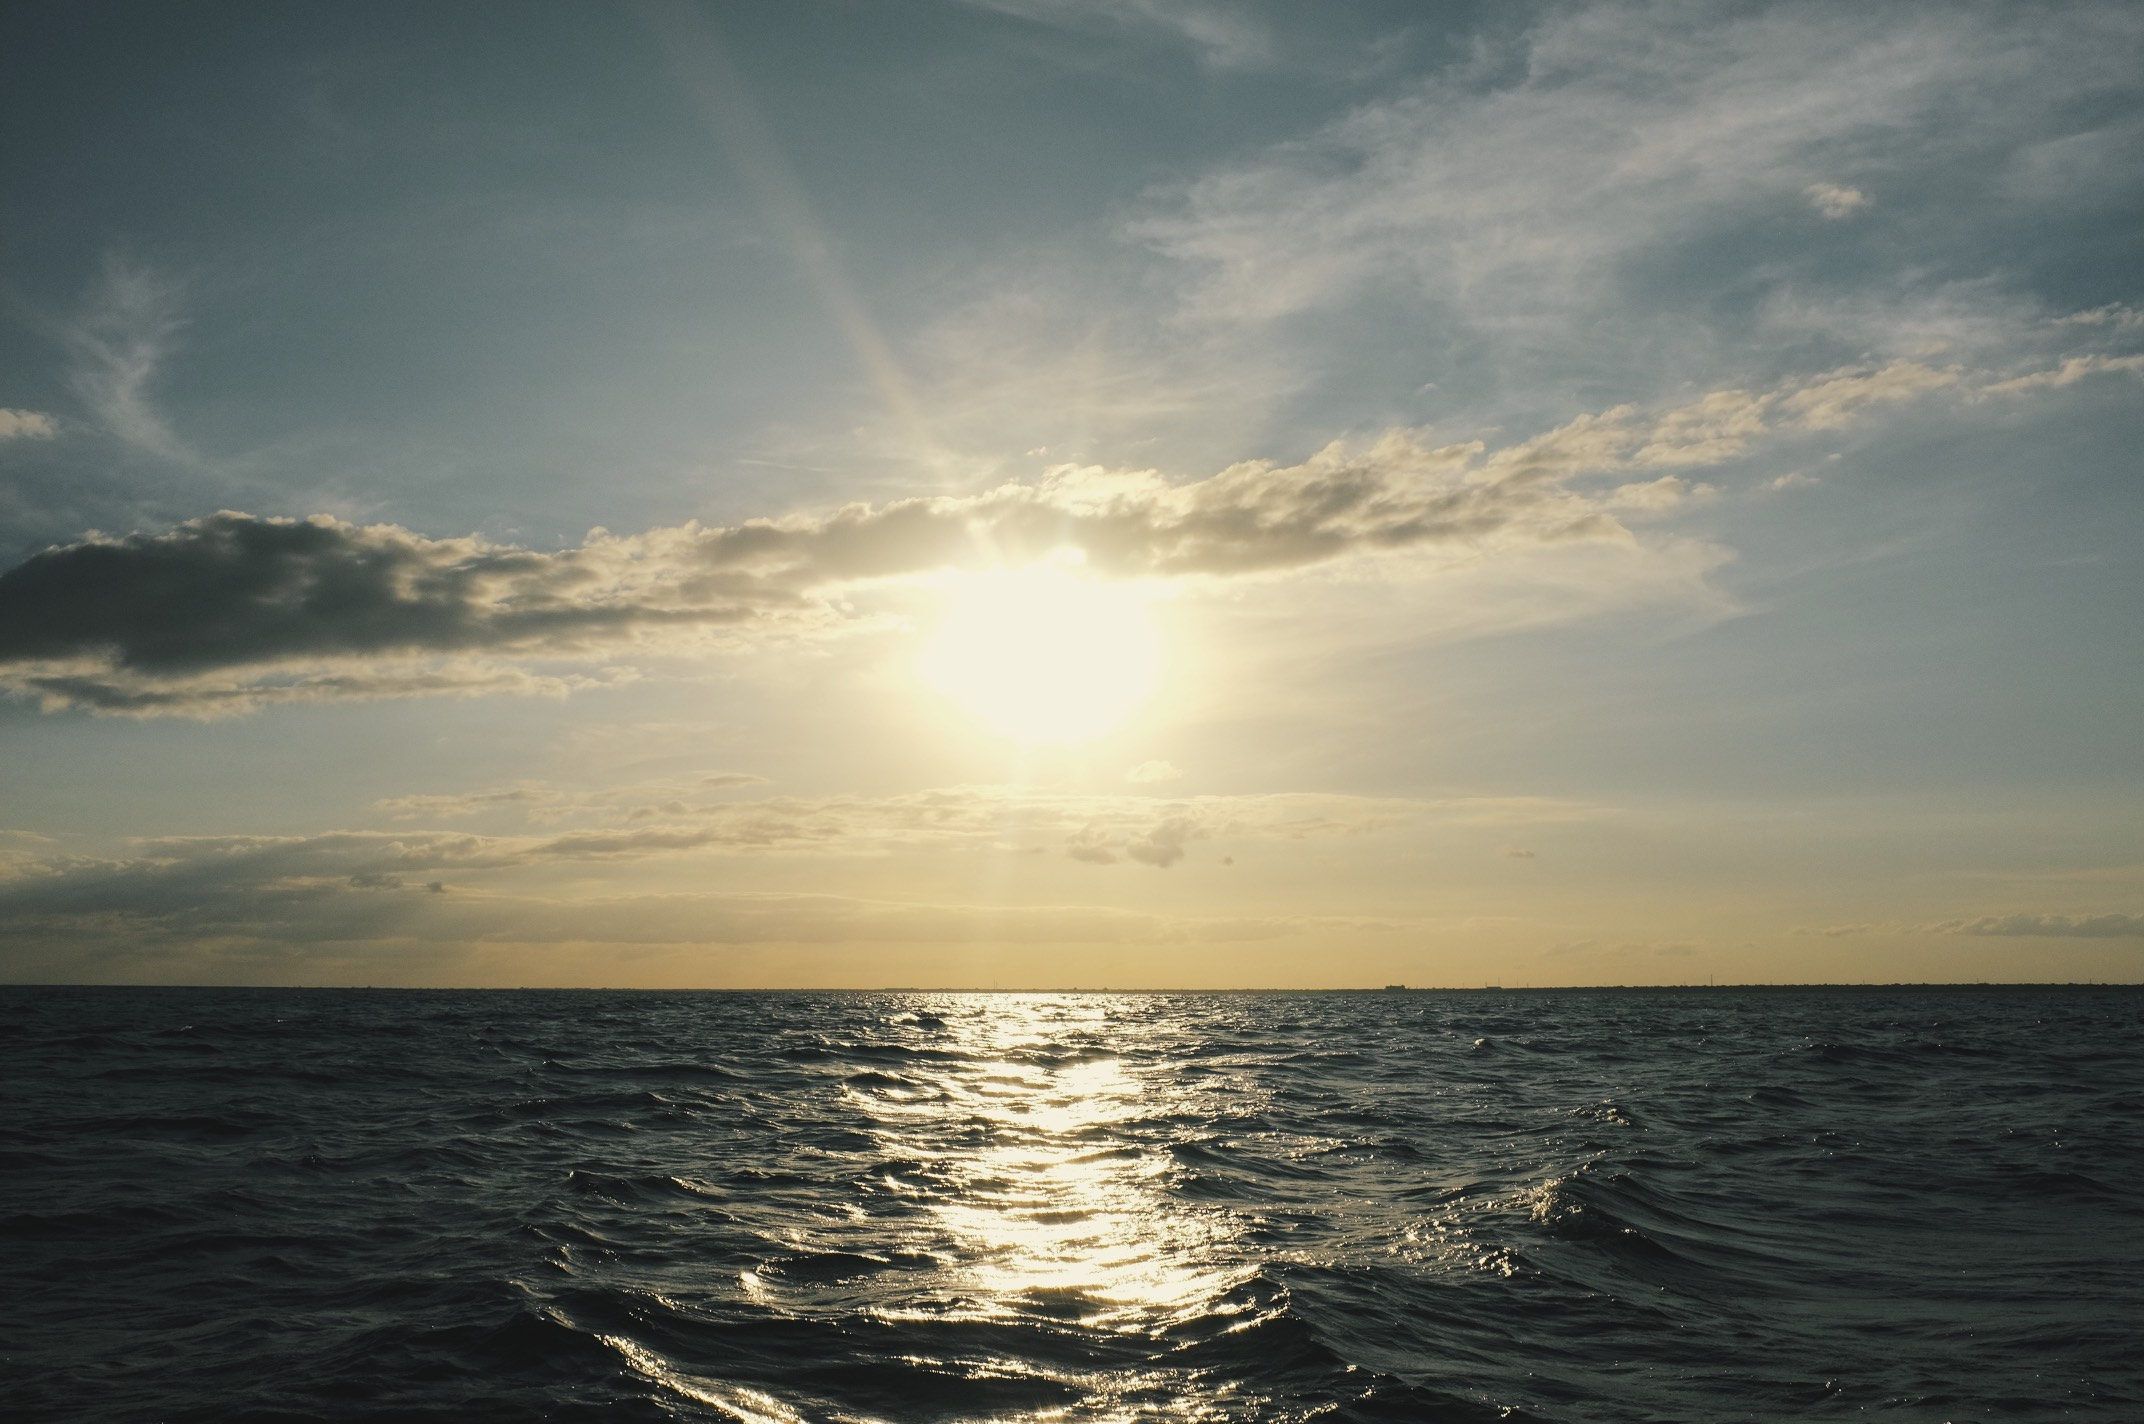 sunset-mayan-riviera-from-sea.jpg